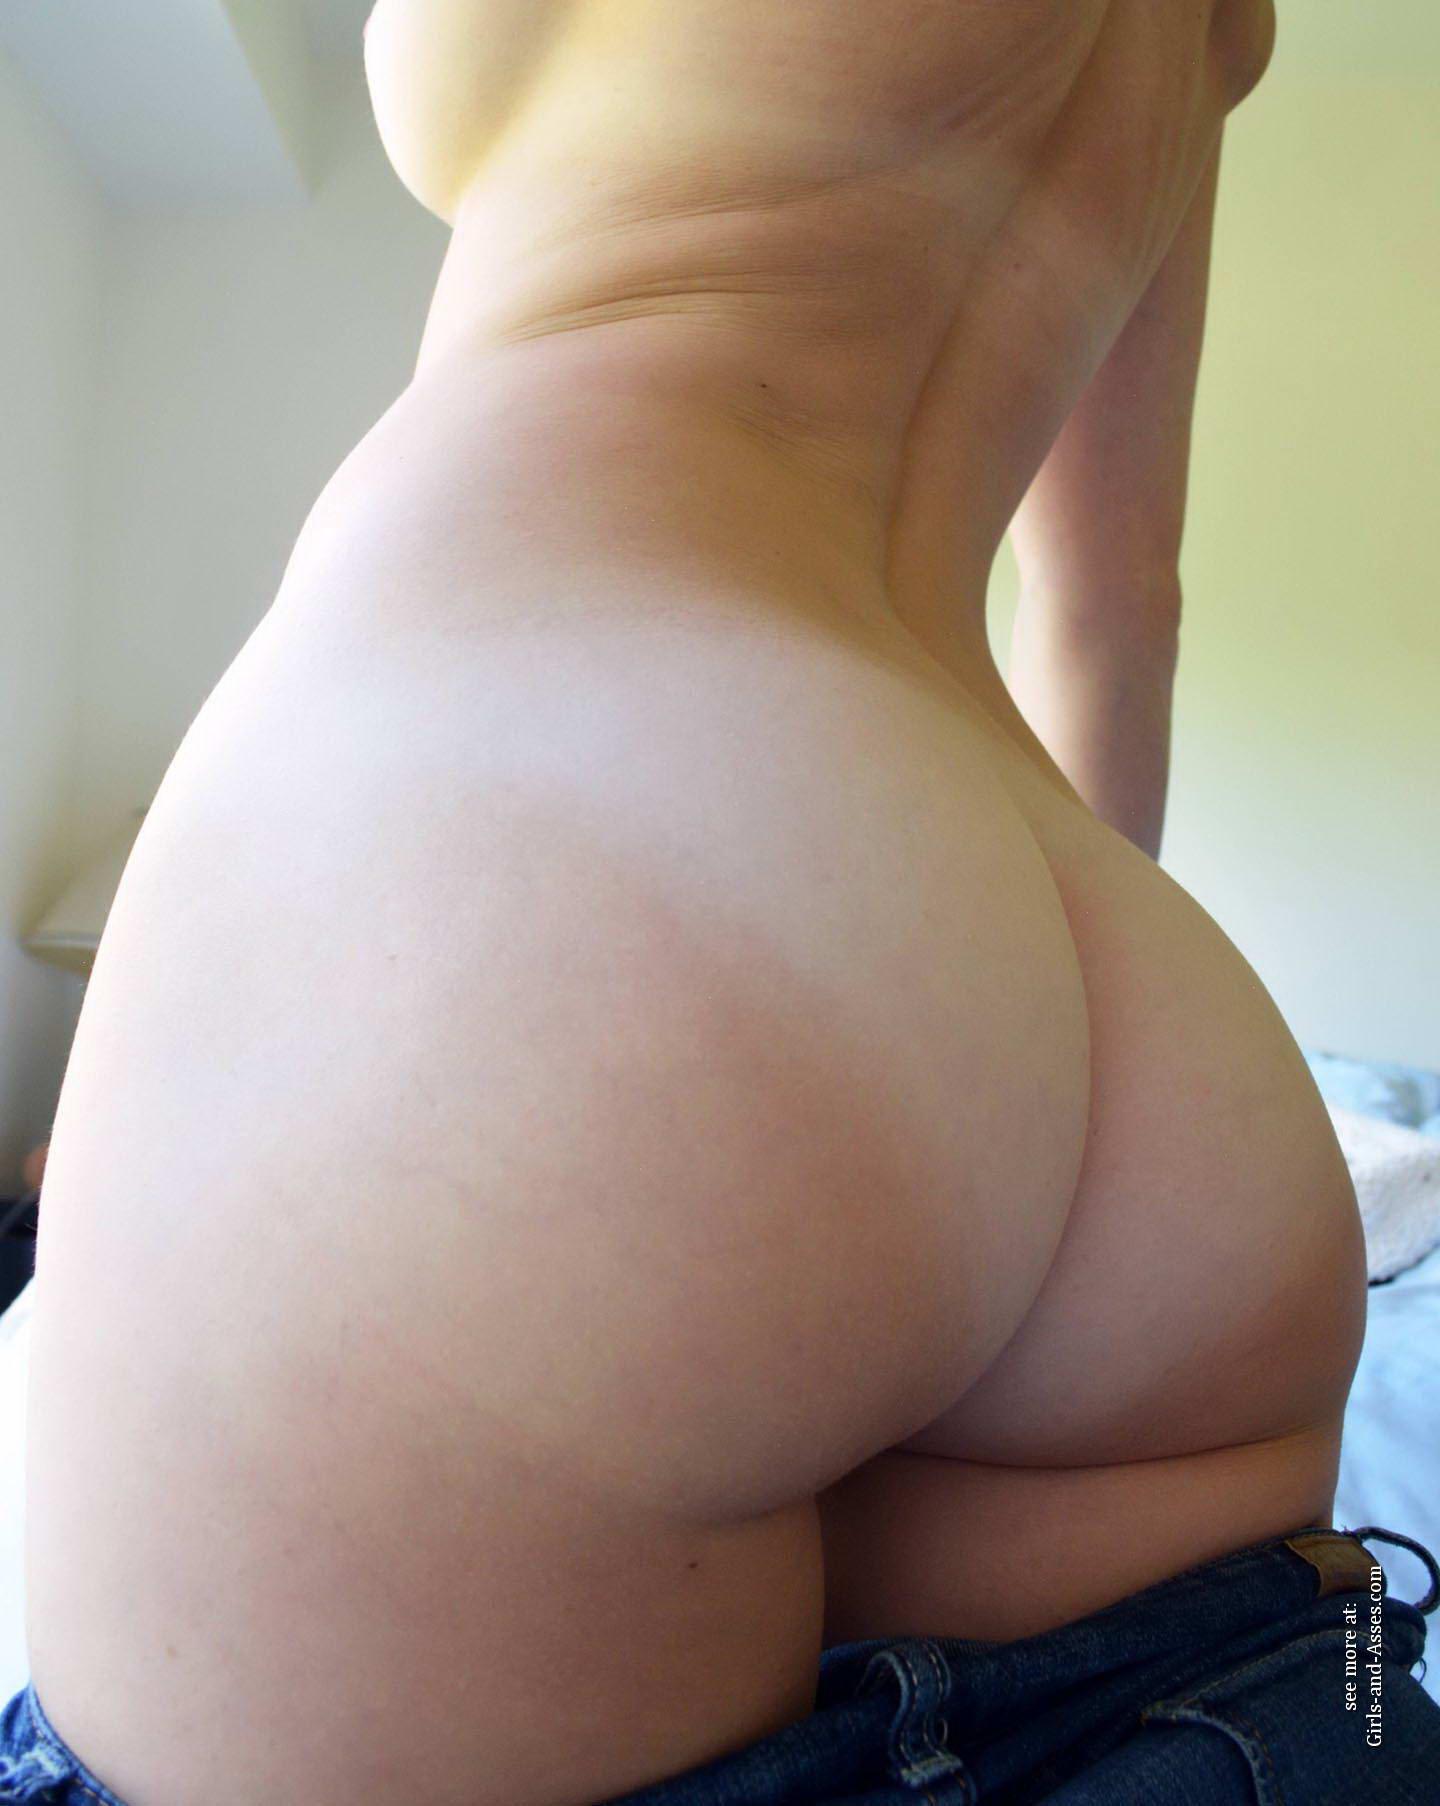 casual girls nude ass 01313